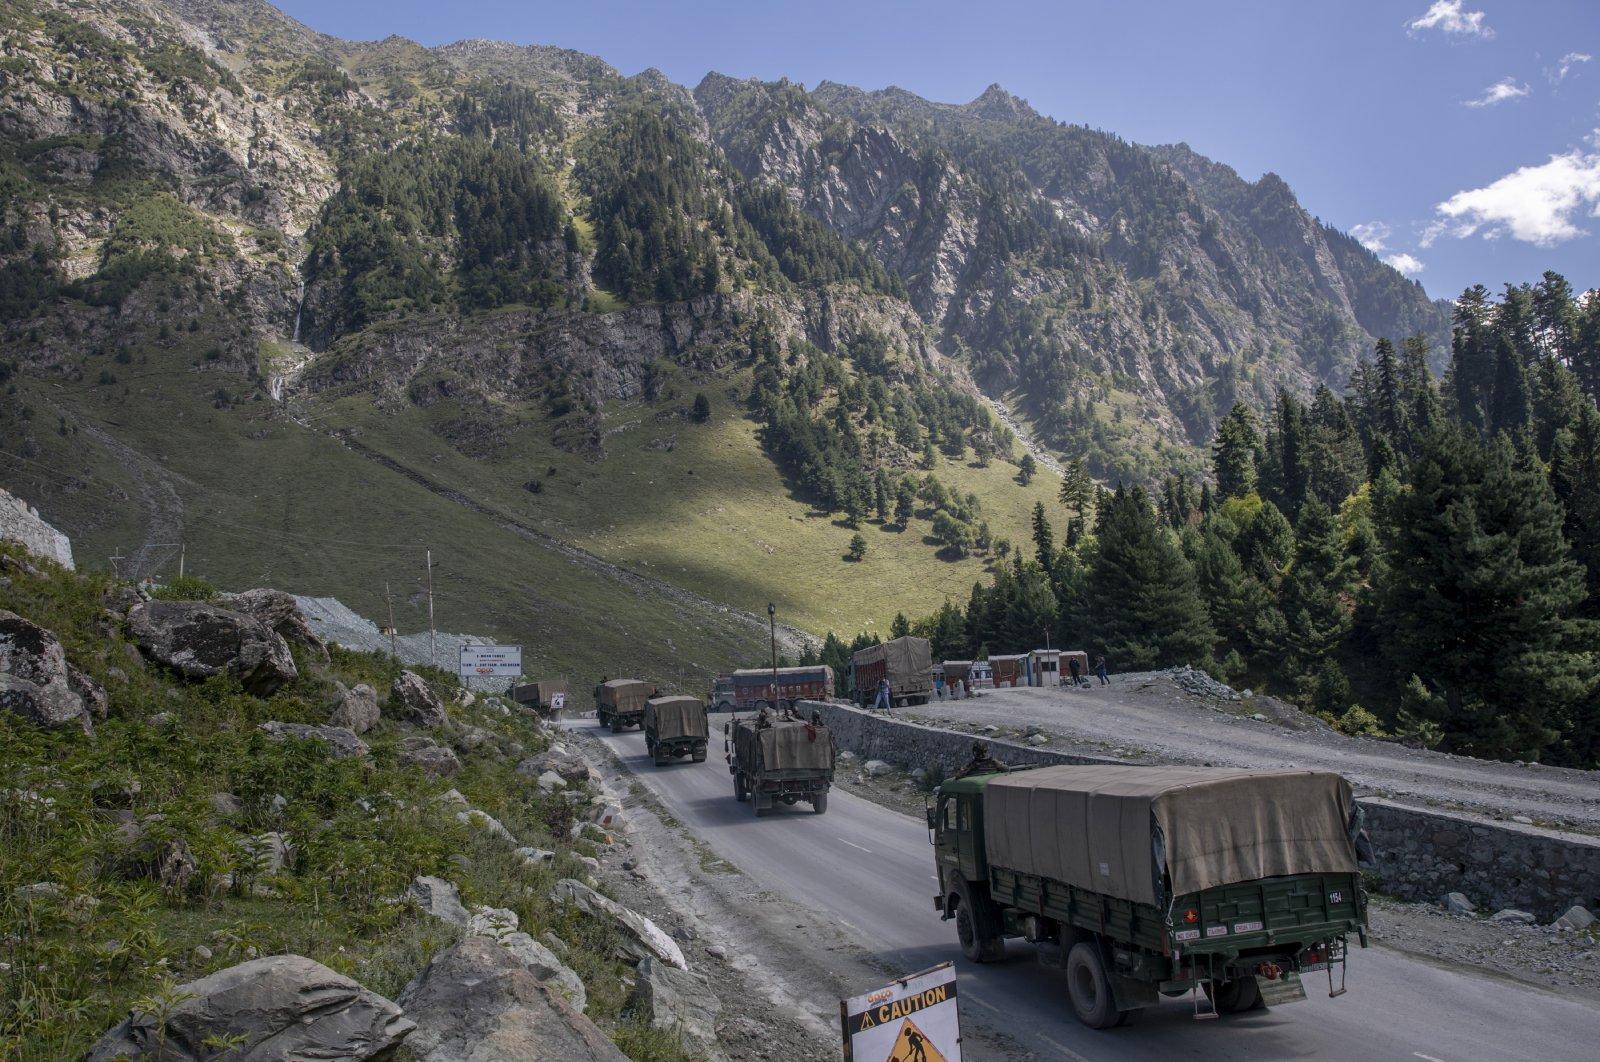 An Indian Army convoy moves on the Srinagar-Ladakh highway in Gagangeer, northeast of Srinagar, Indian-controlled Kashmir, Sept. 9, 2020. (AP Photo)